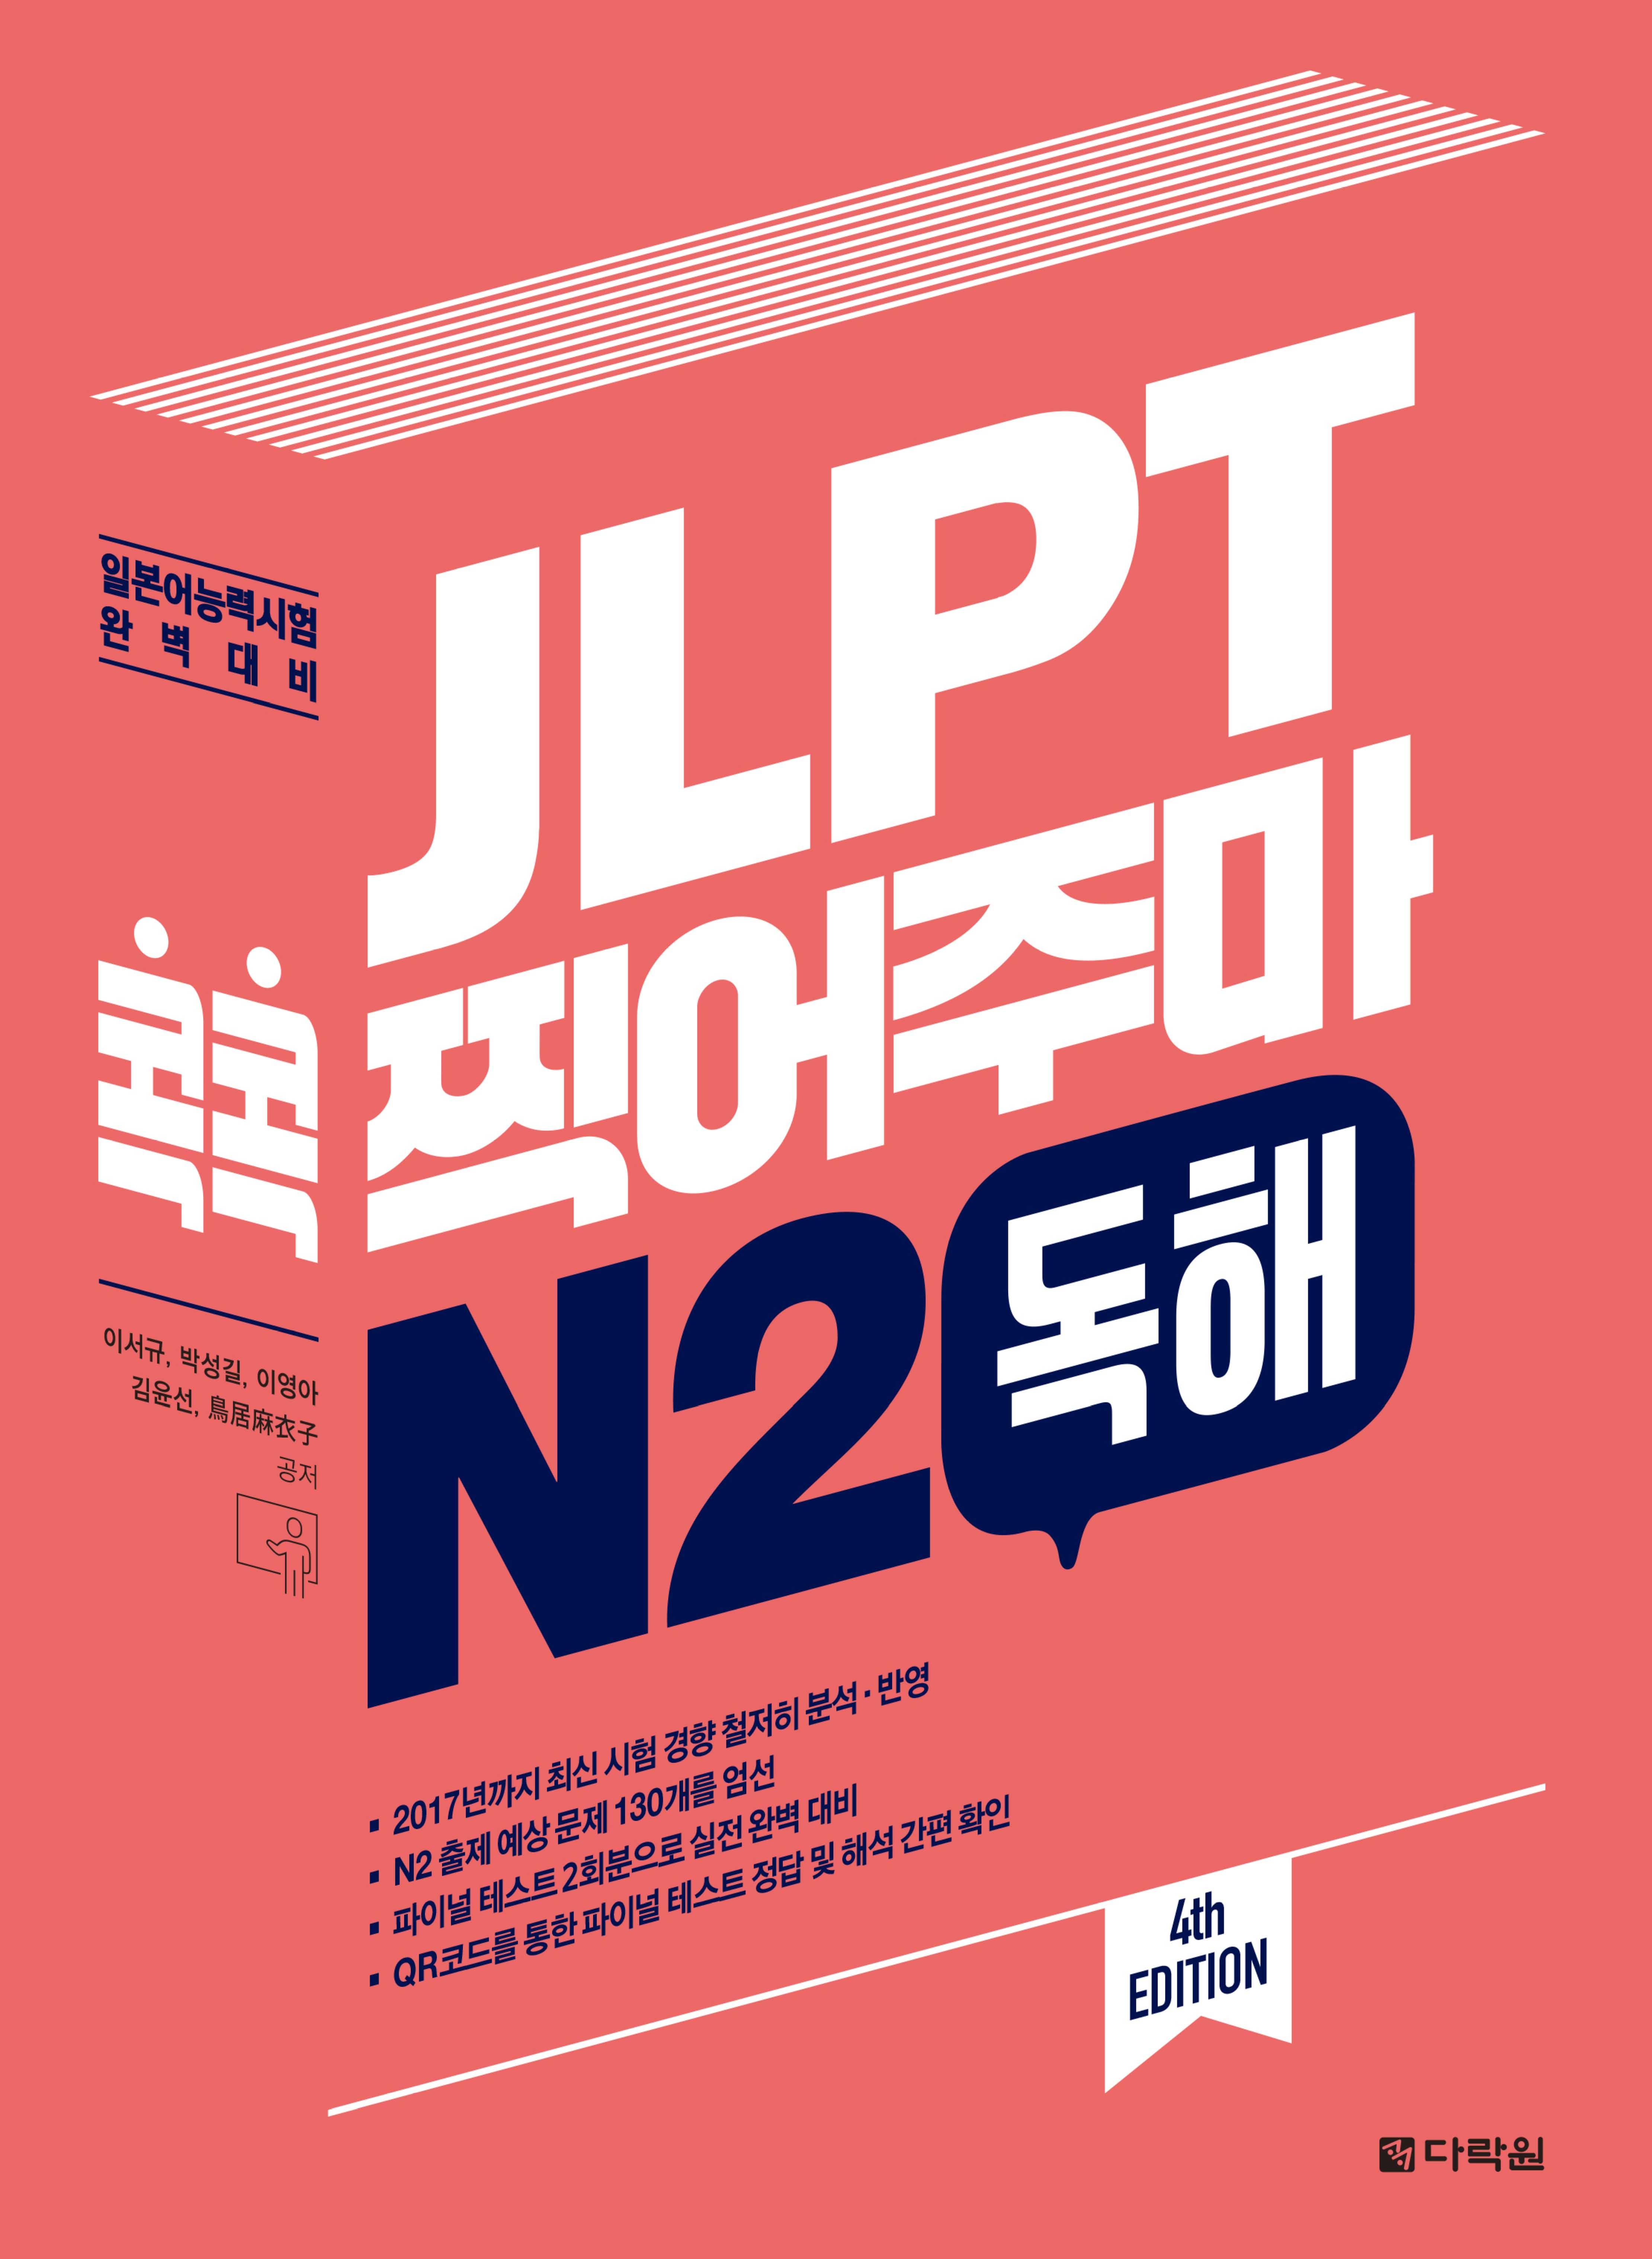 [JLPT 콕콕 찍어주마] (4th EDITION) JLPT 콕콕 찍어주마 N2 독해